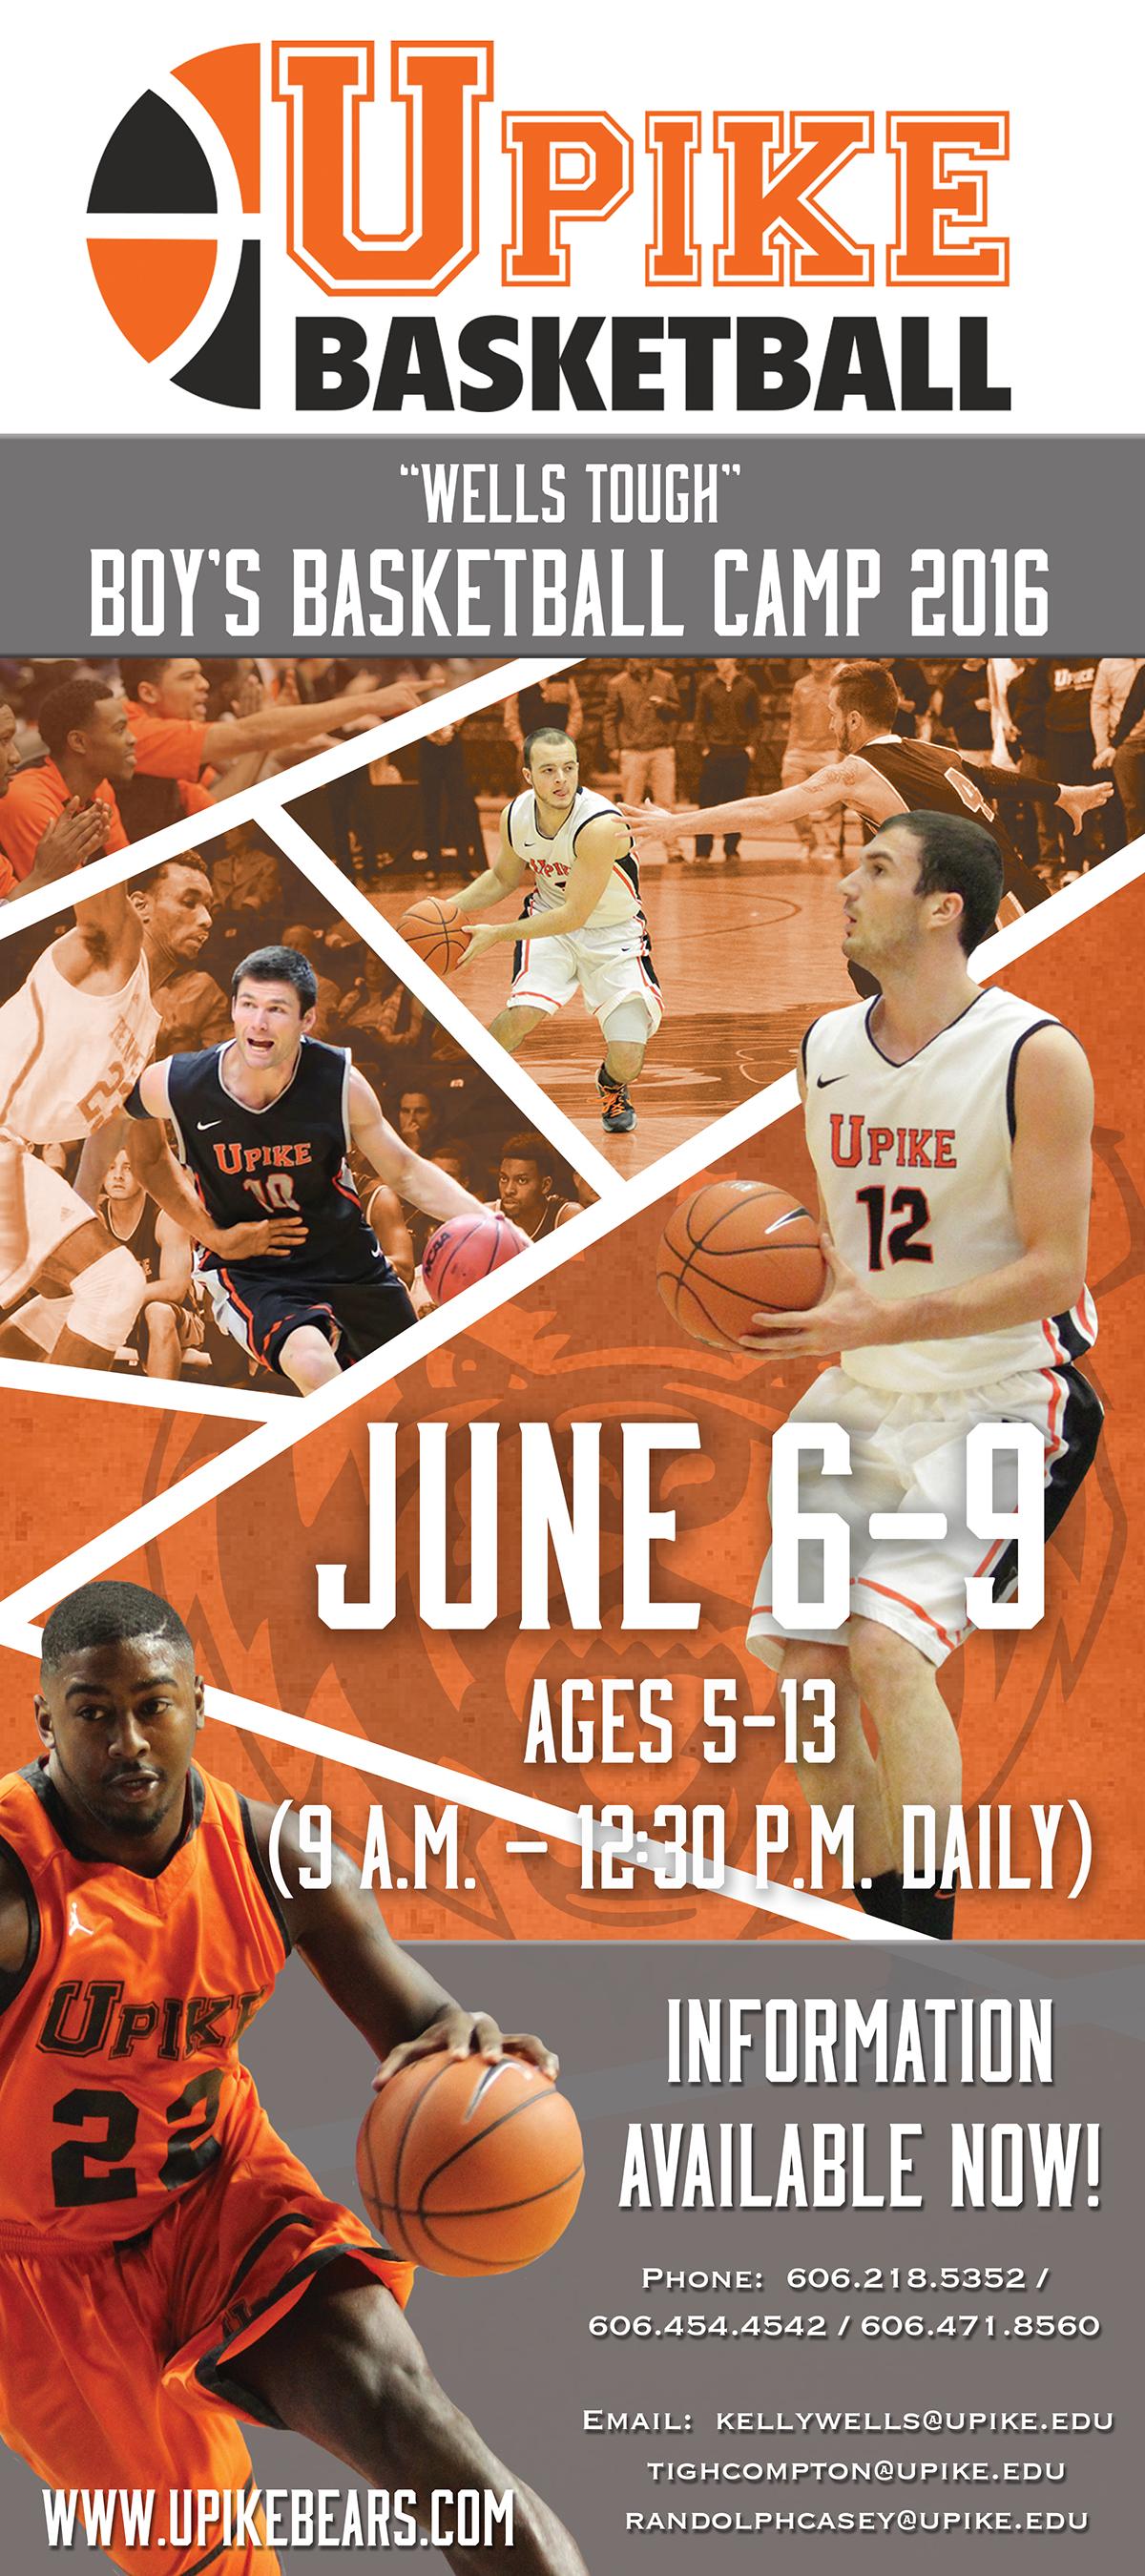 UPIKE Men's Basketball Summer Camp Promo on Behance